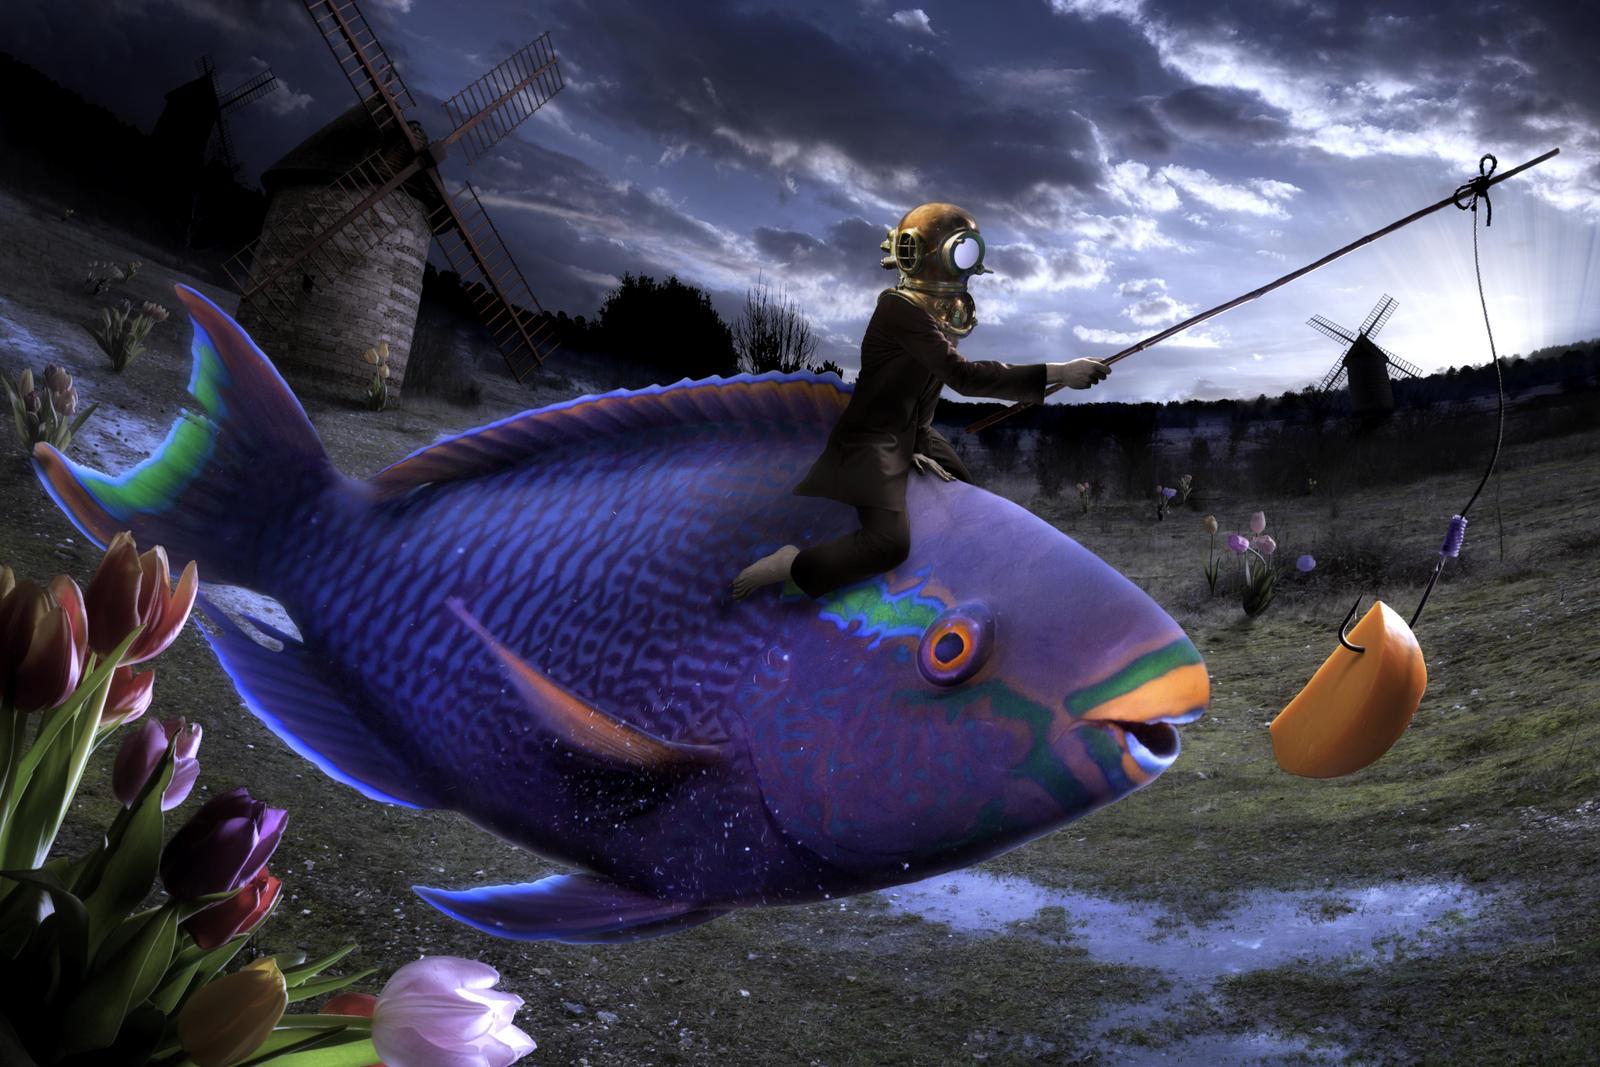 The Flying Dutchman by gyaban